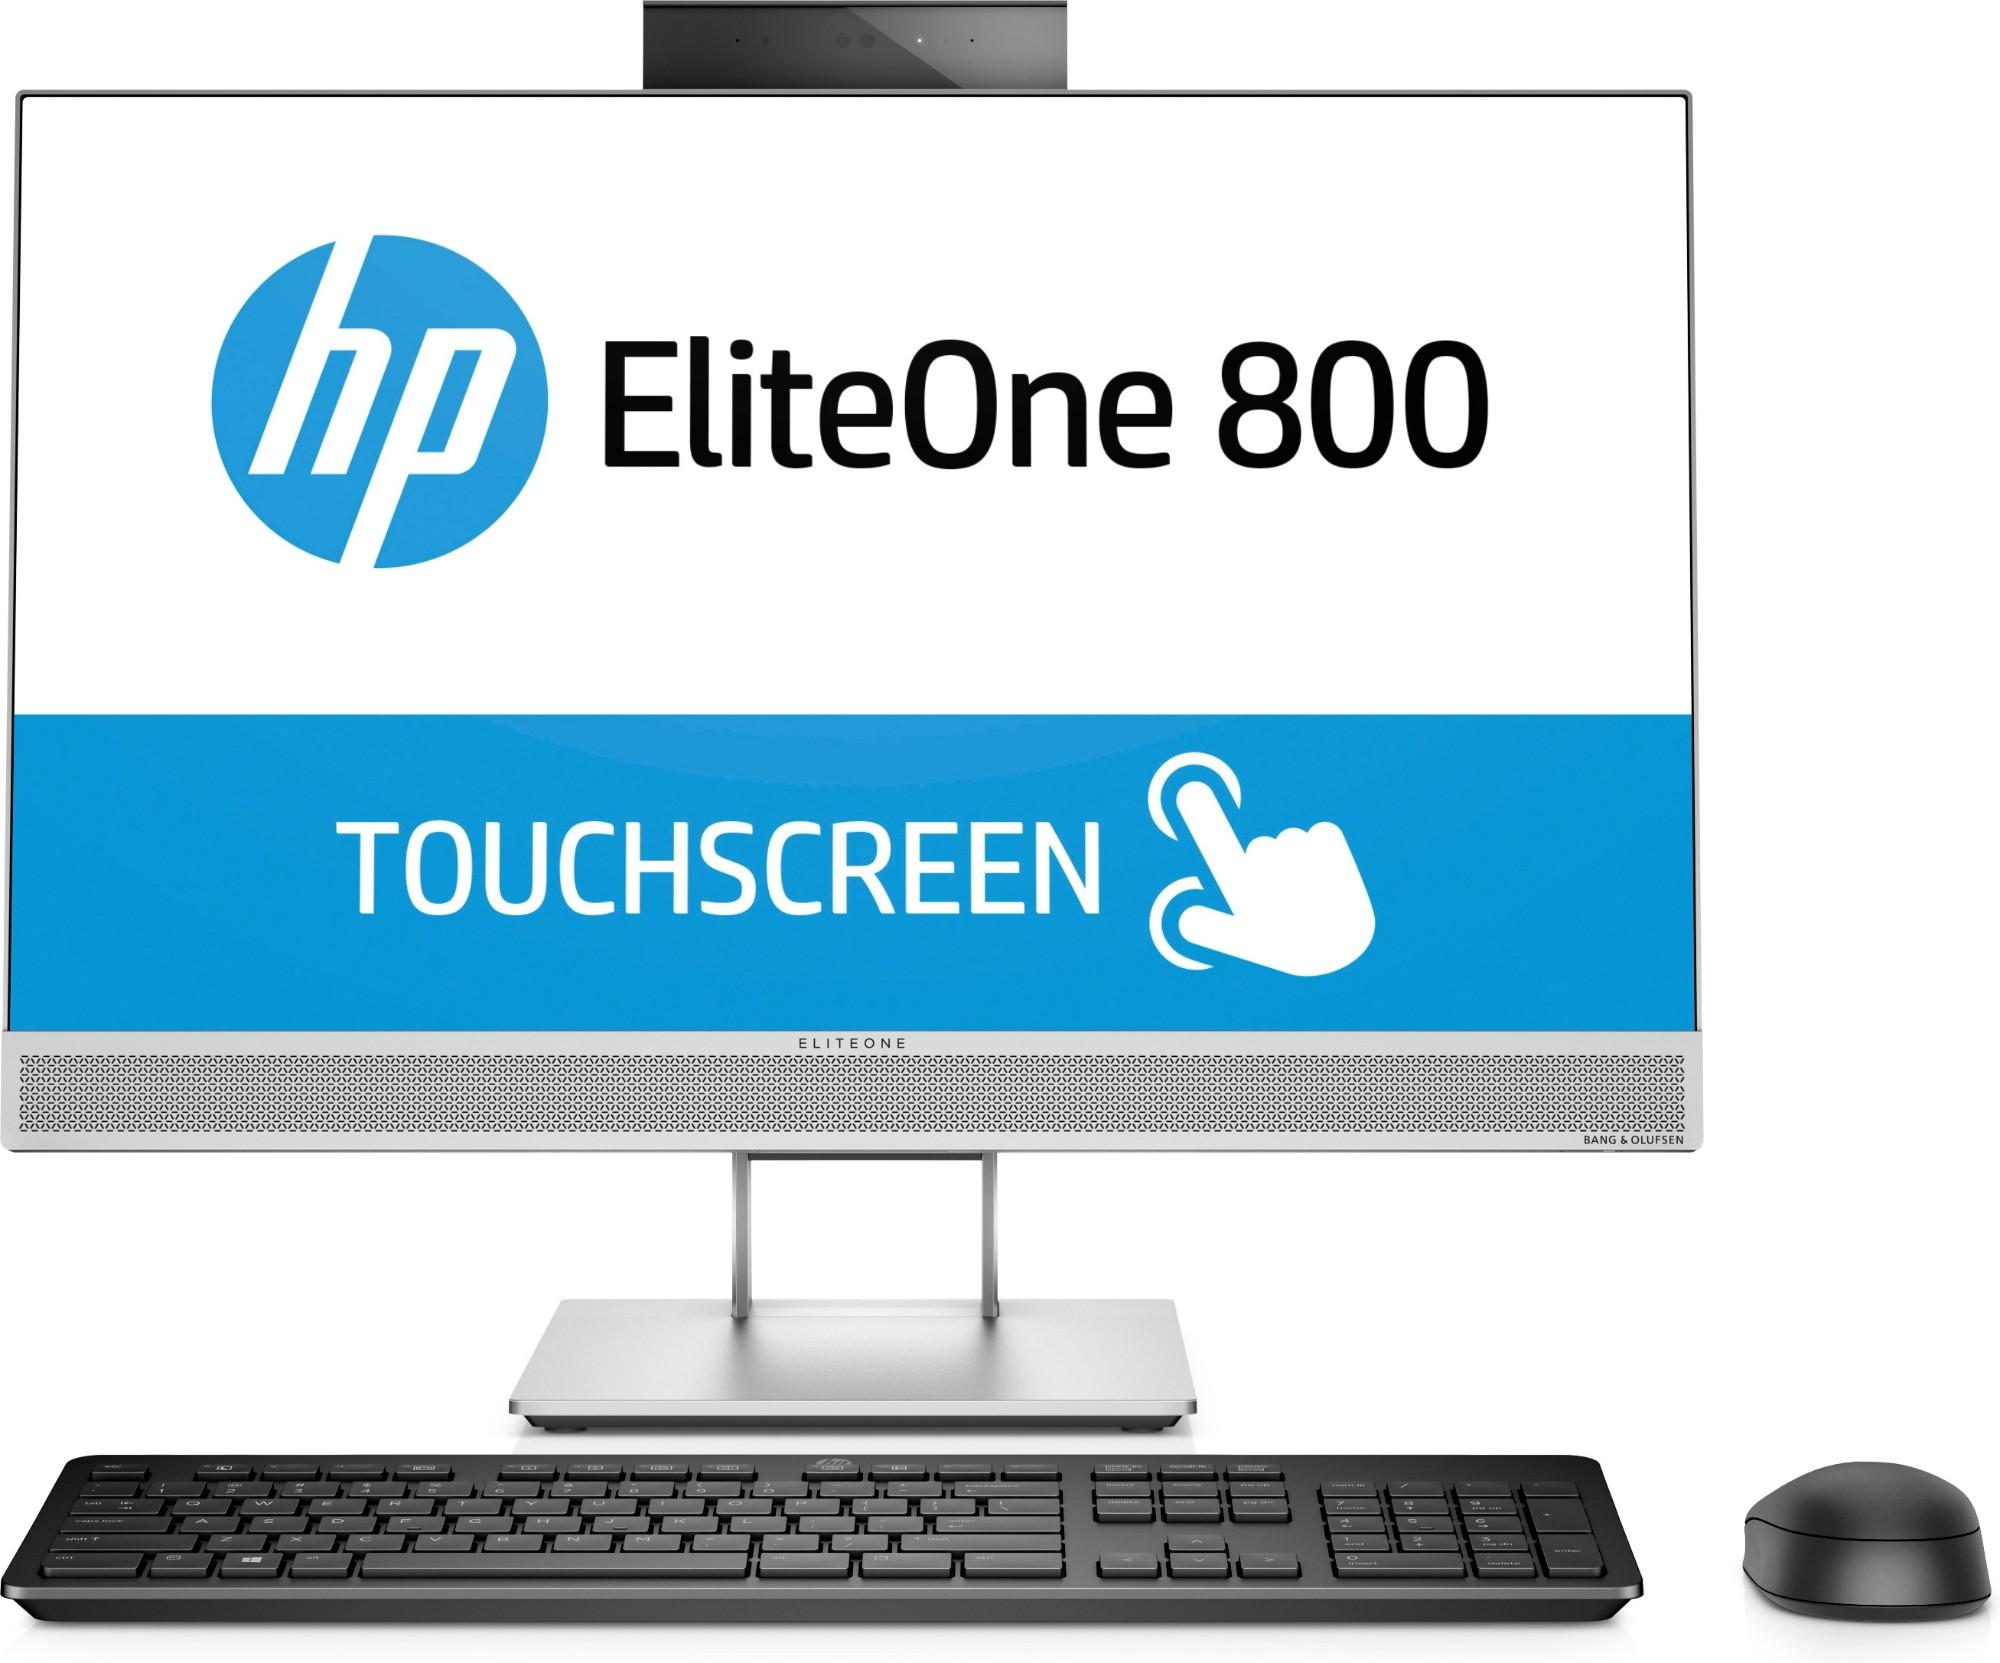 HP EliteOne 800 G3 3.4GHz i5-7500 7th gen Intel® Core™ i5 23.8